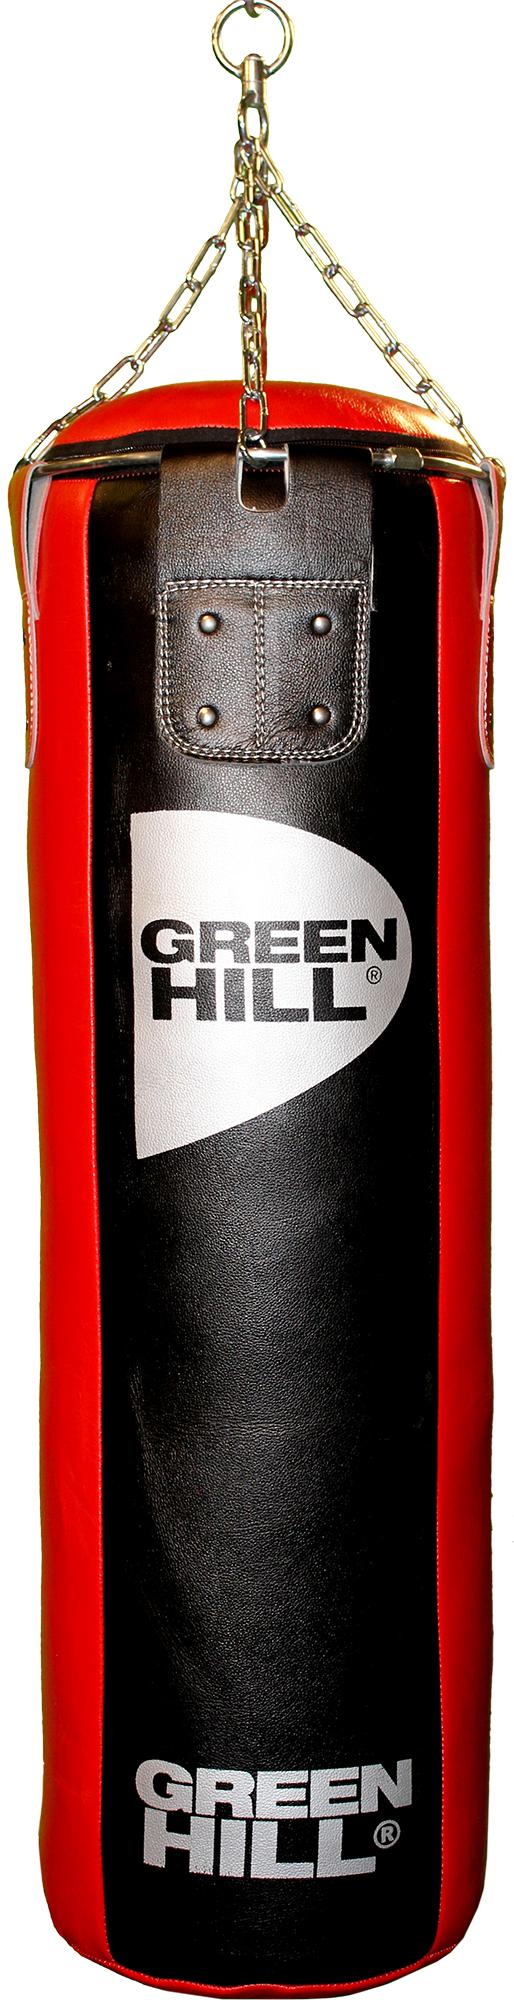 Green Hill Мешок набивной Green Hill, 47 кг cпальный мешок helios батыр сок 2 green 0612